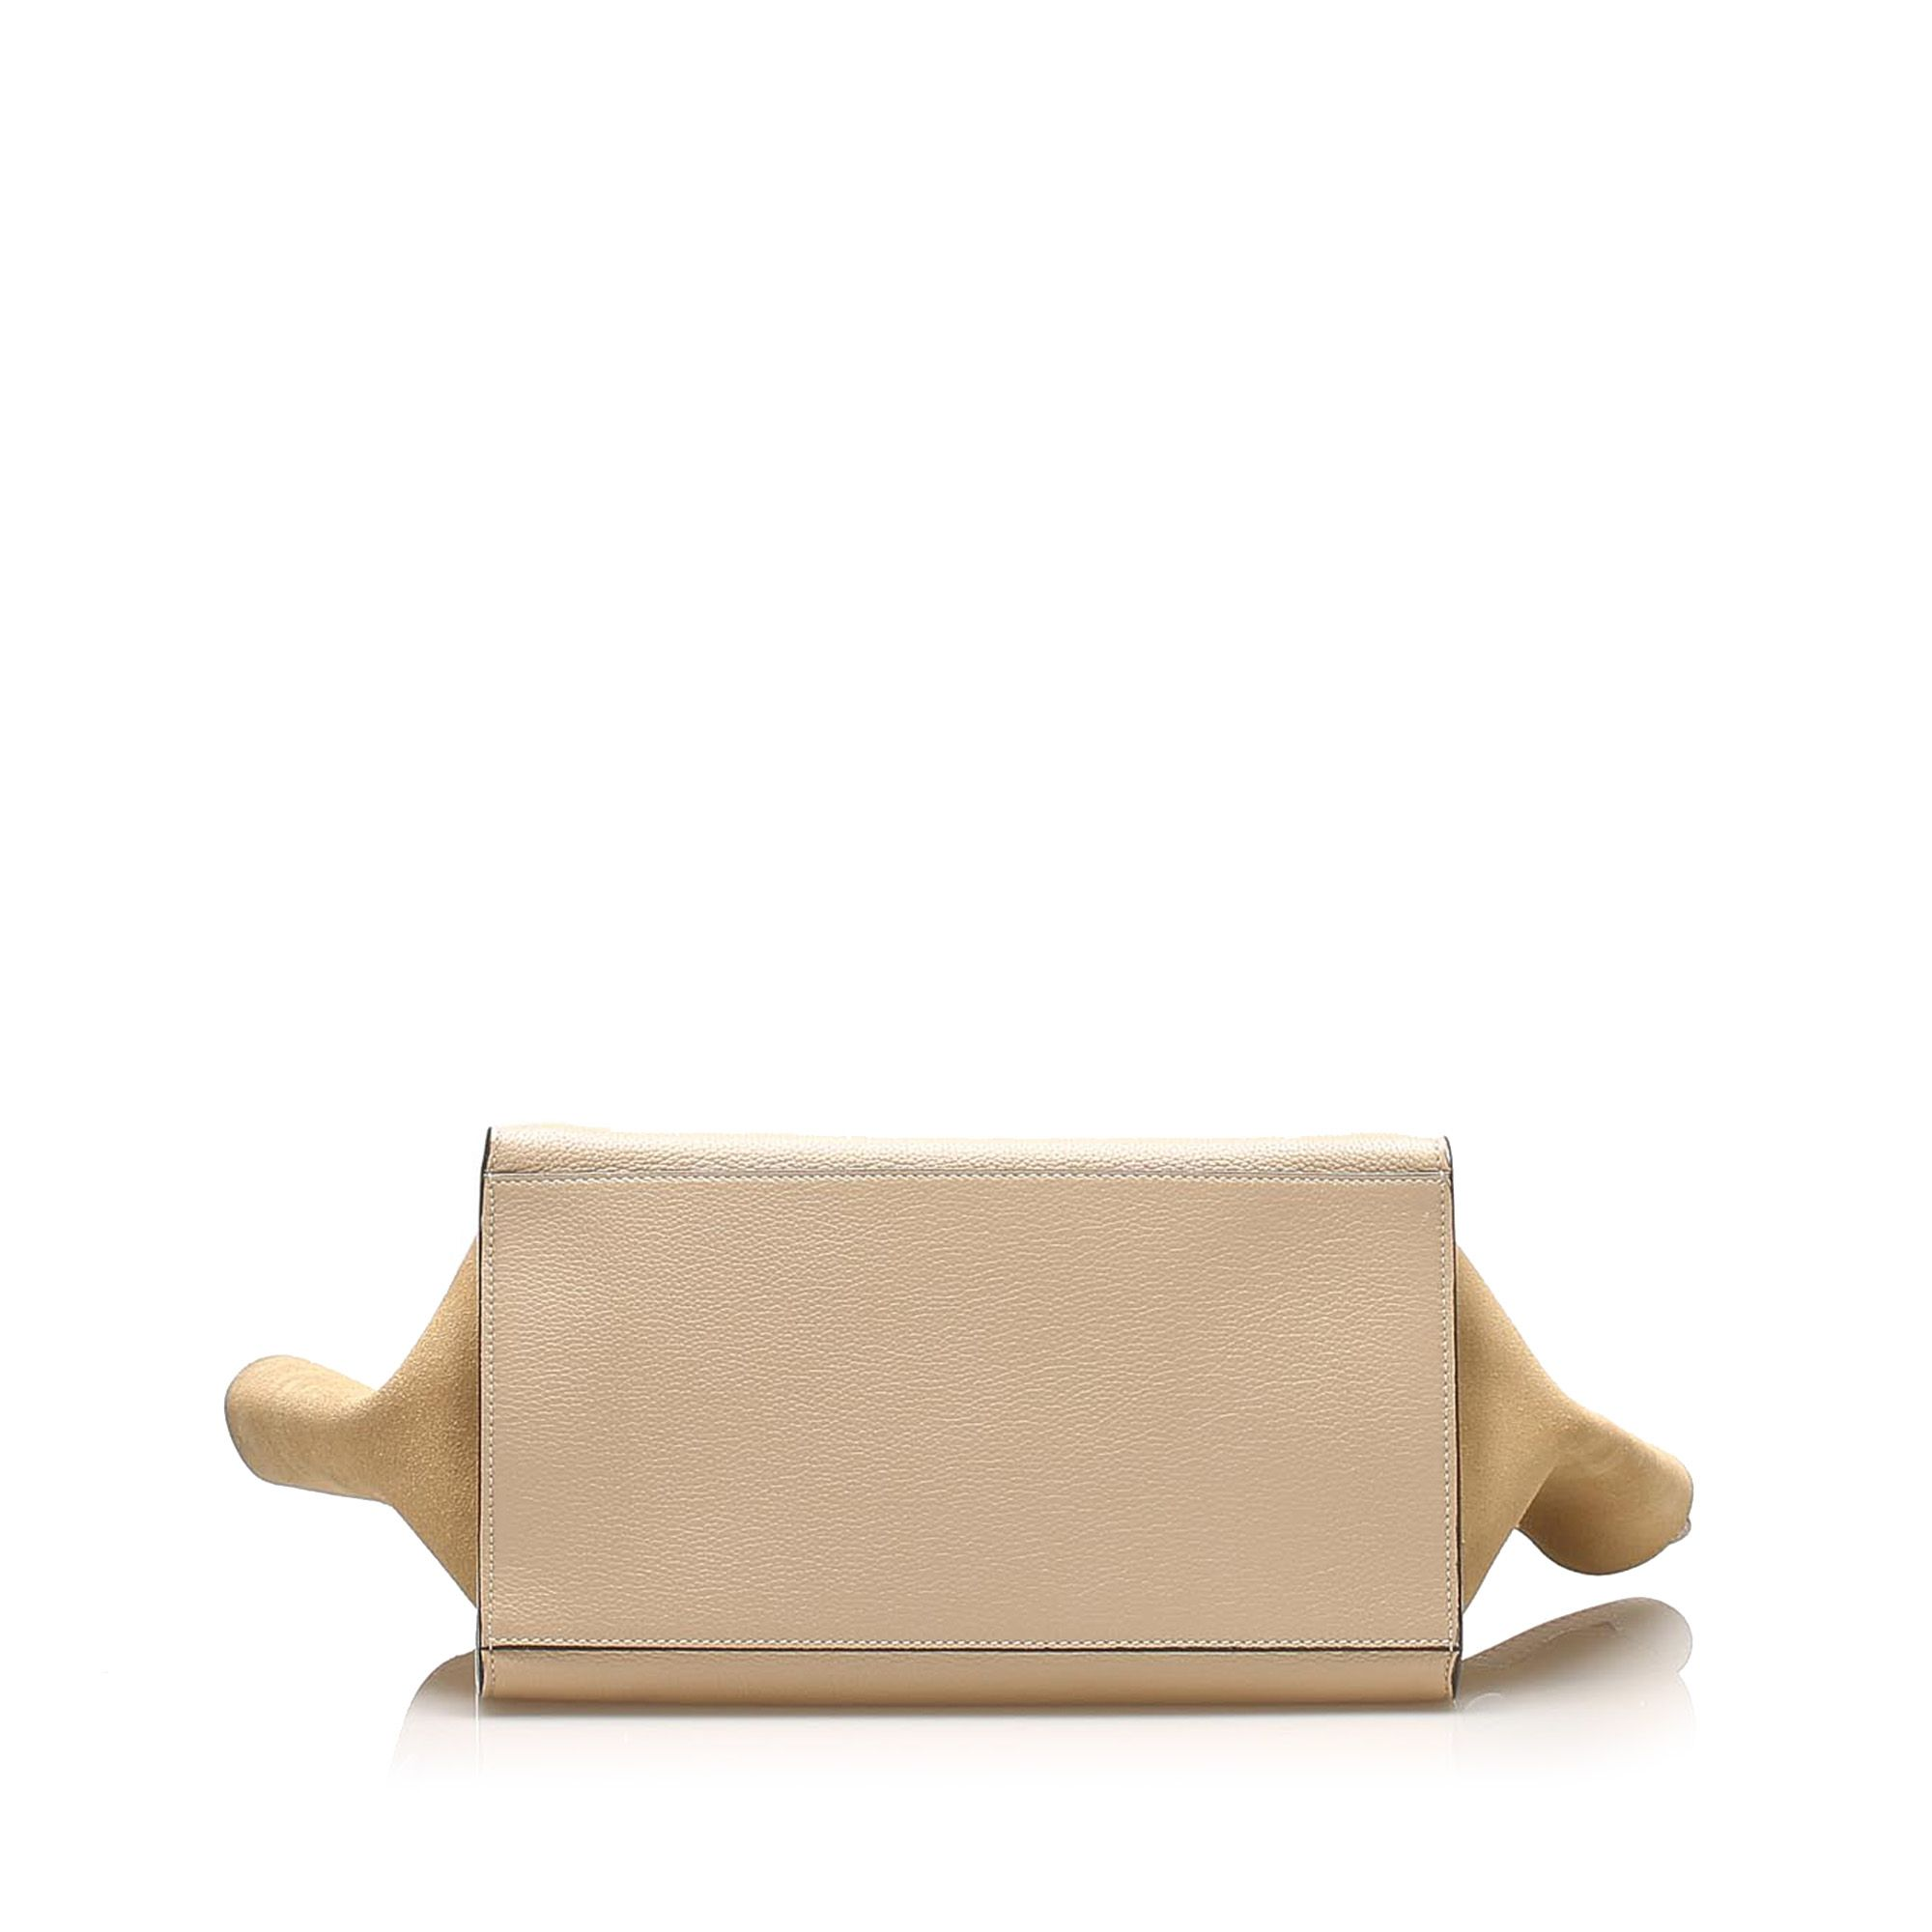 Vintage Celine Medium Trapeze Leather Satchel Brown